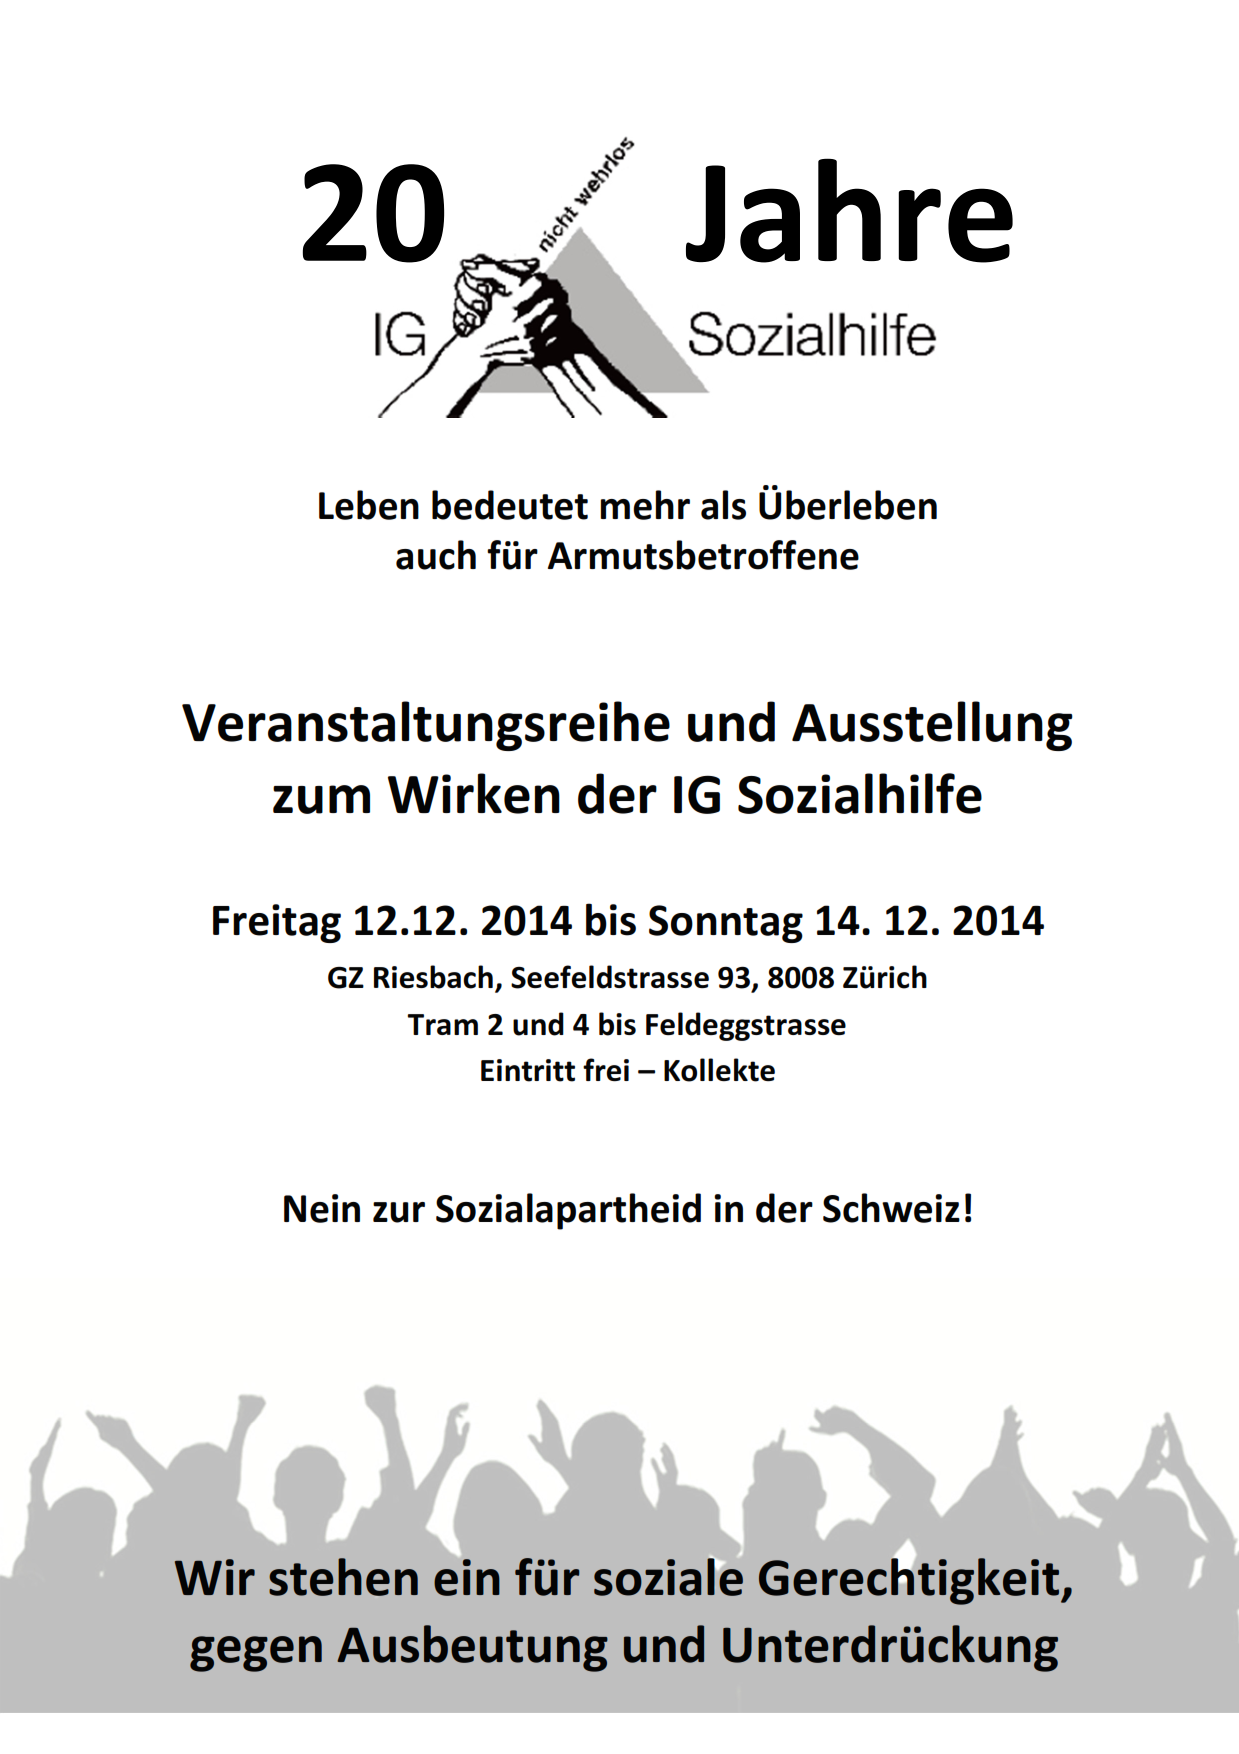 Flugblatt 20 Jahre IG Sozialhilfe 2014.korr_001